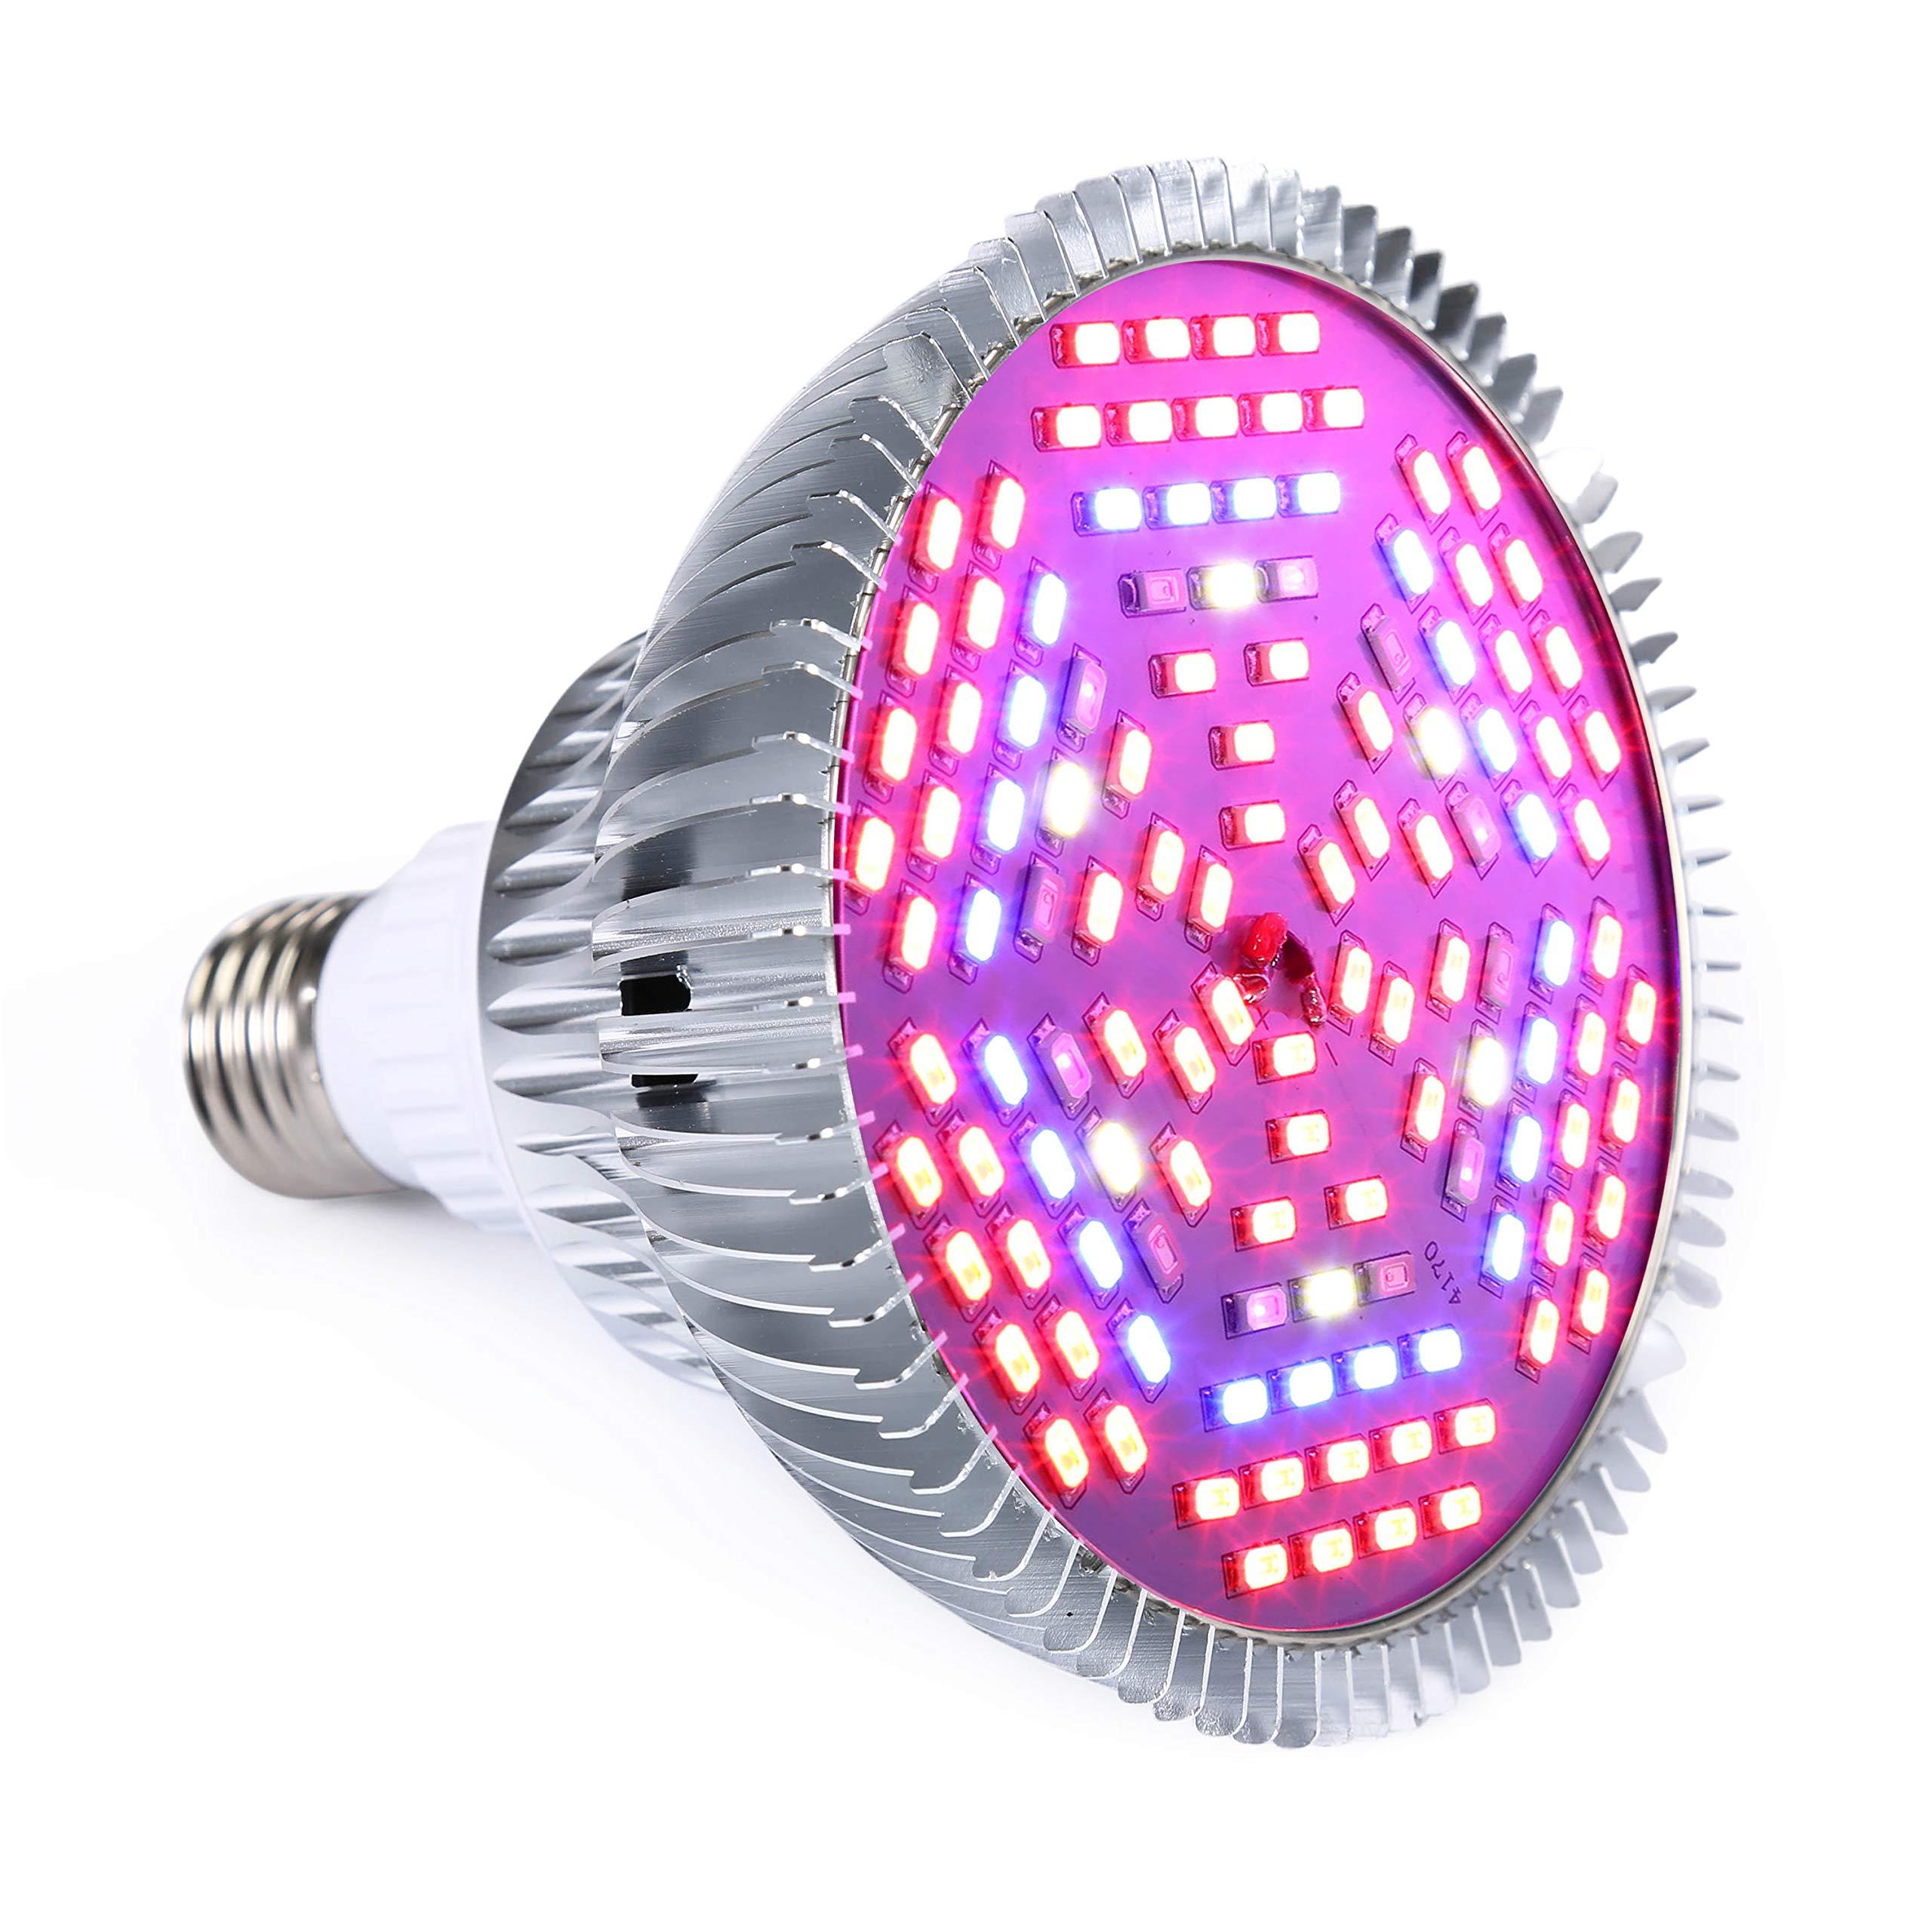 Led Grow Light Bulb E26 Full Spectrum Plant Growing Lights for Indoor Plants Garden Greenhouse 80W 120 LEDs